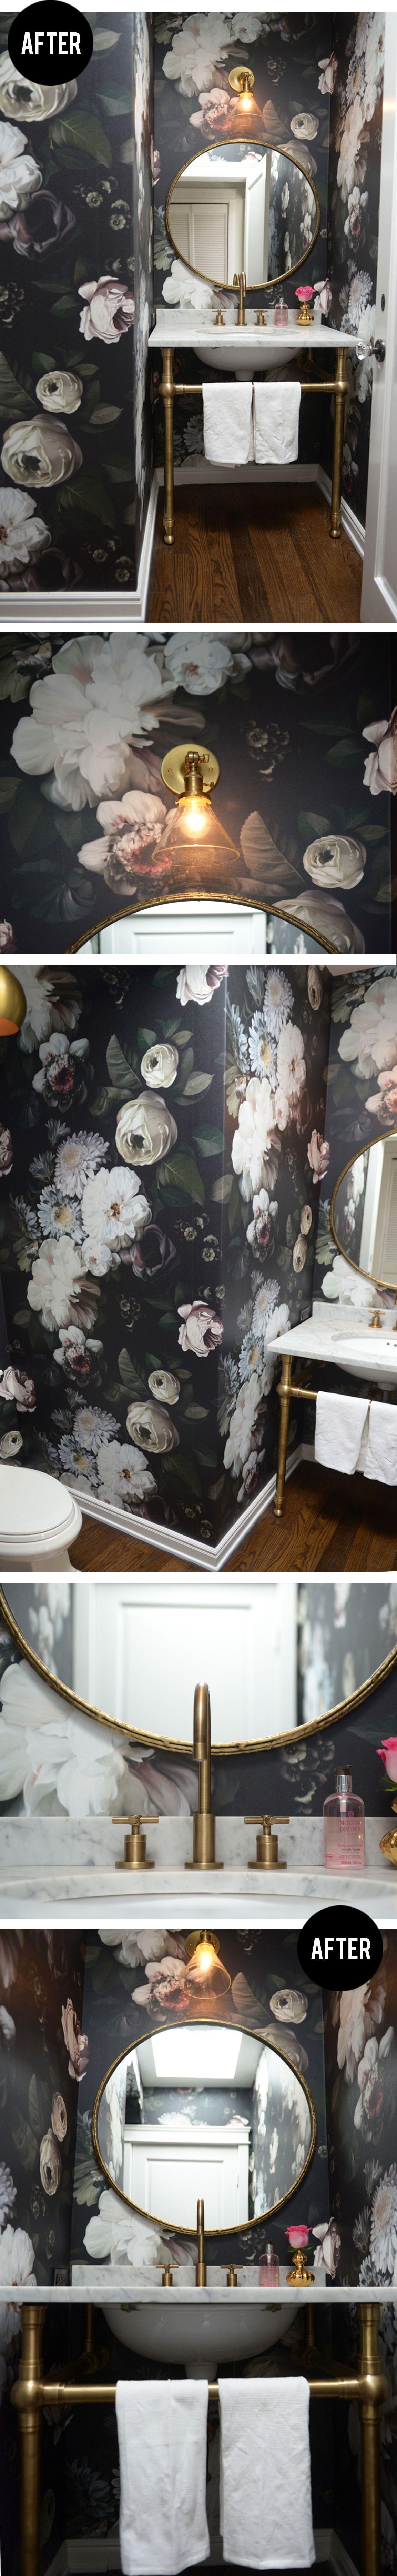 powder room update // dark floral wallpaper & brass fixtures #bathrooms